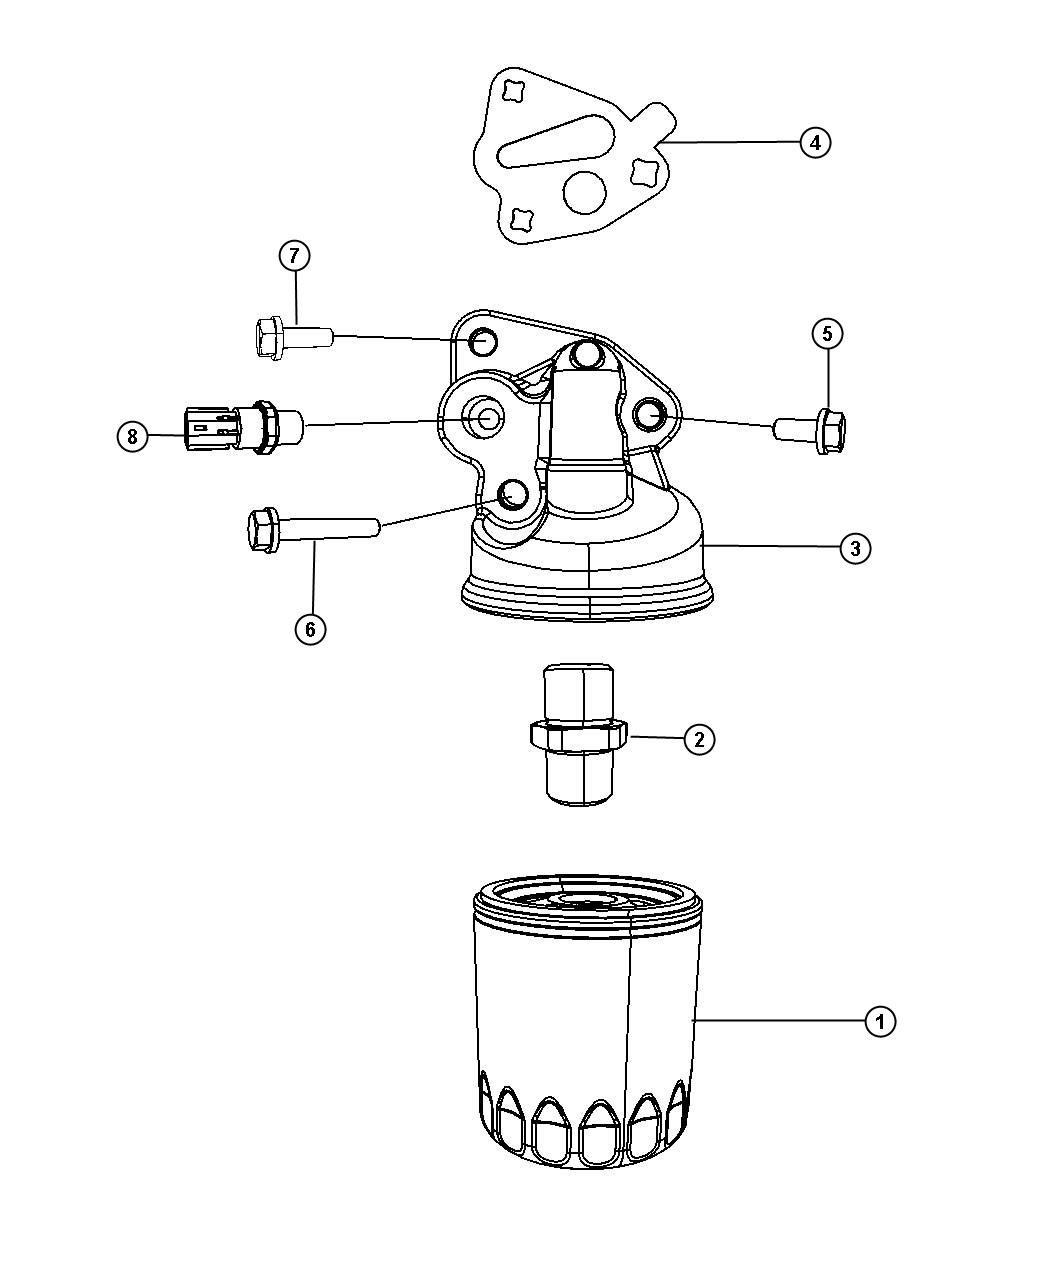 Dodge Caravan Adapter Oil Filter Includes Connector